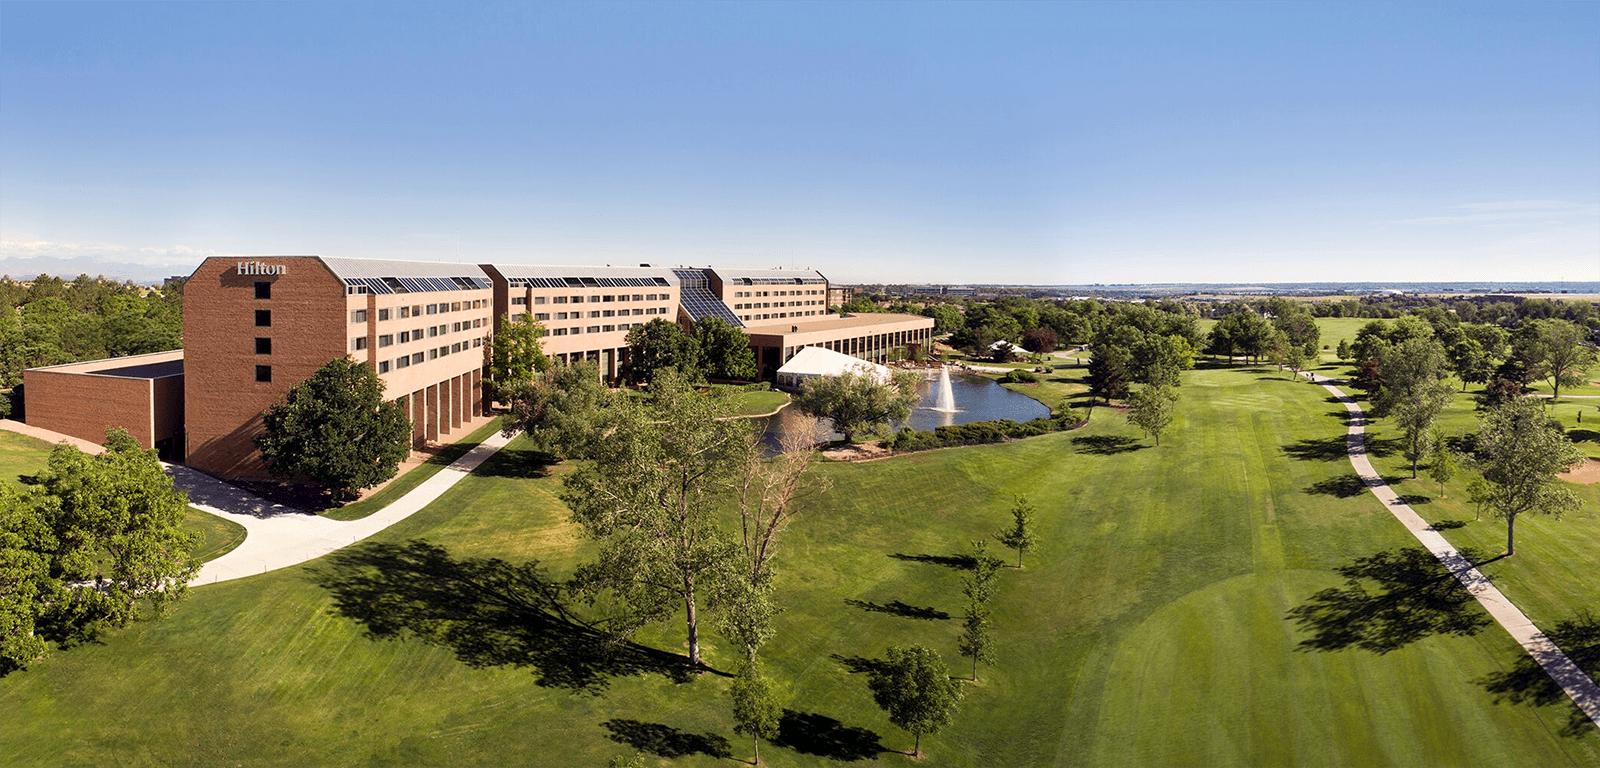 Exterior Hilton Denver Inverness in Colorado